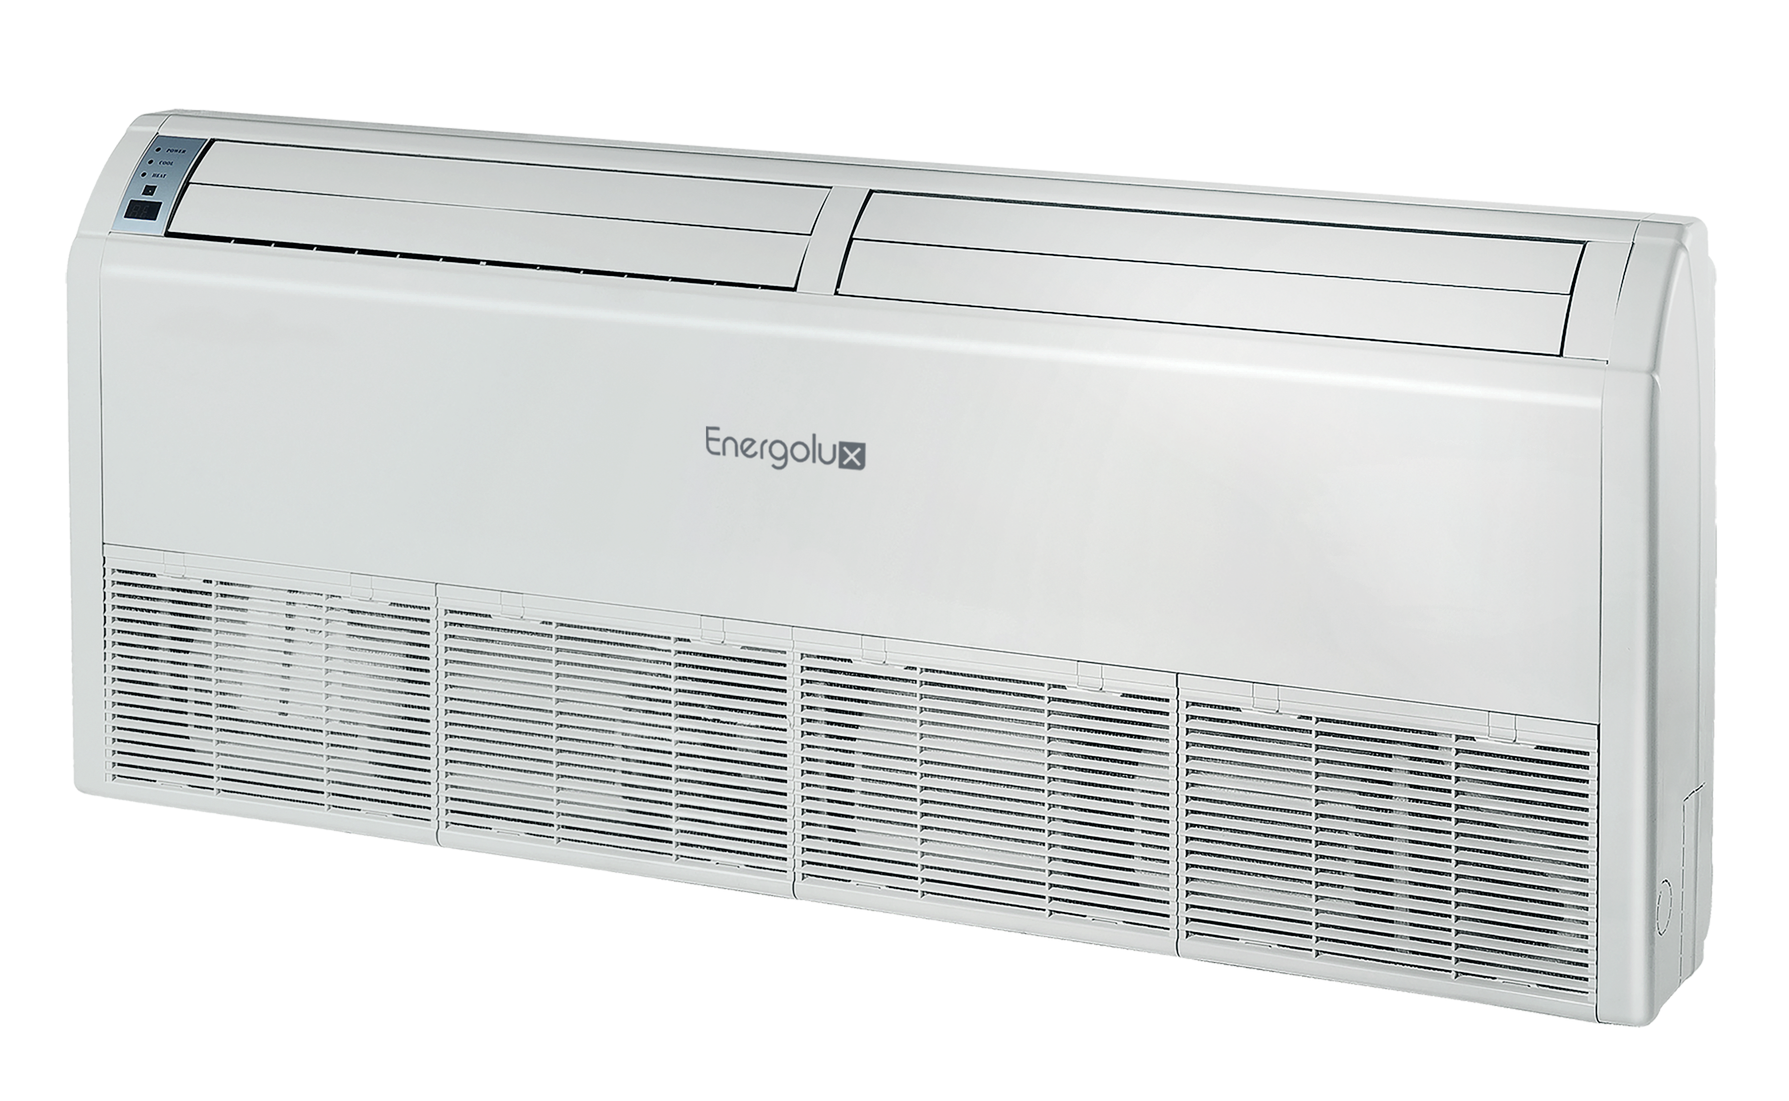 Energolux SMZCF36V2AI